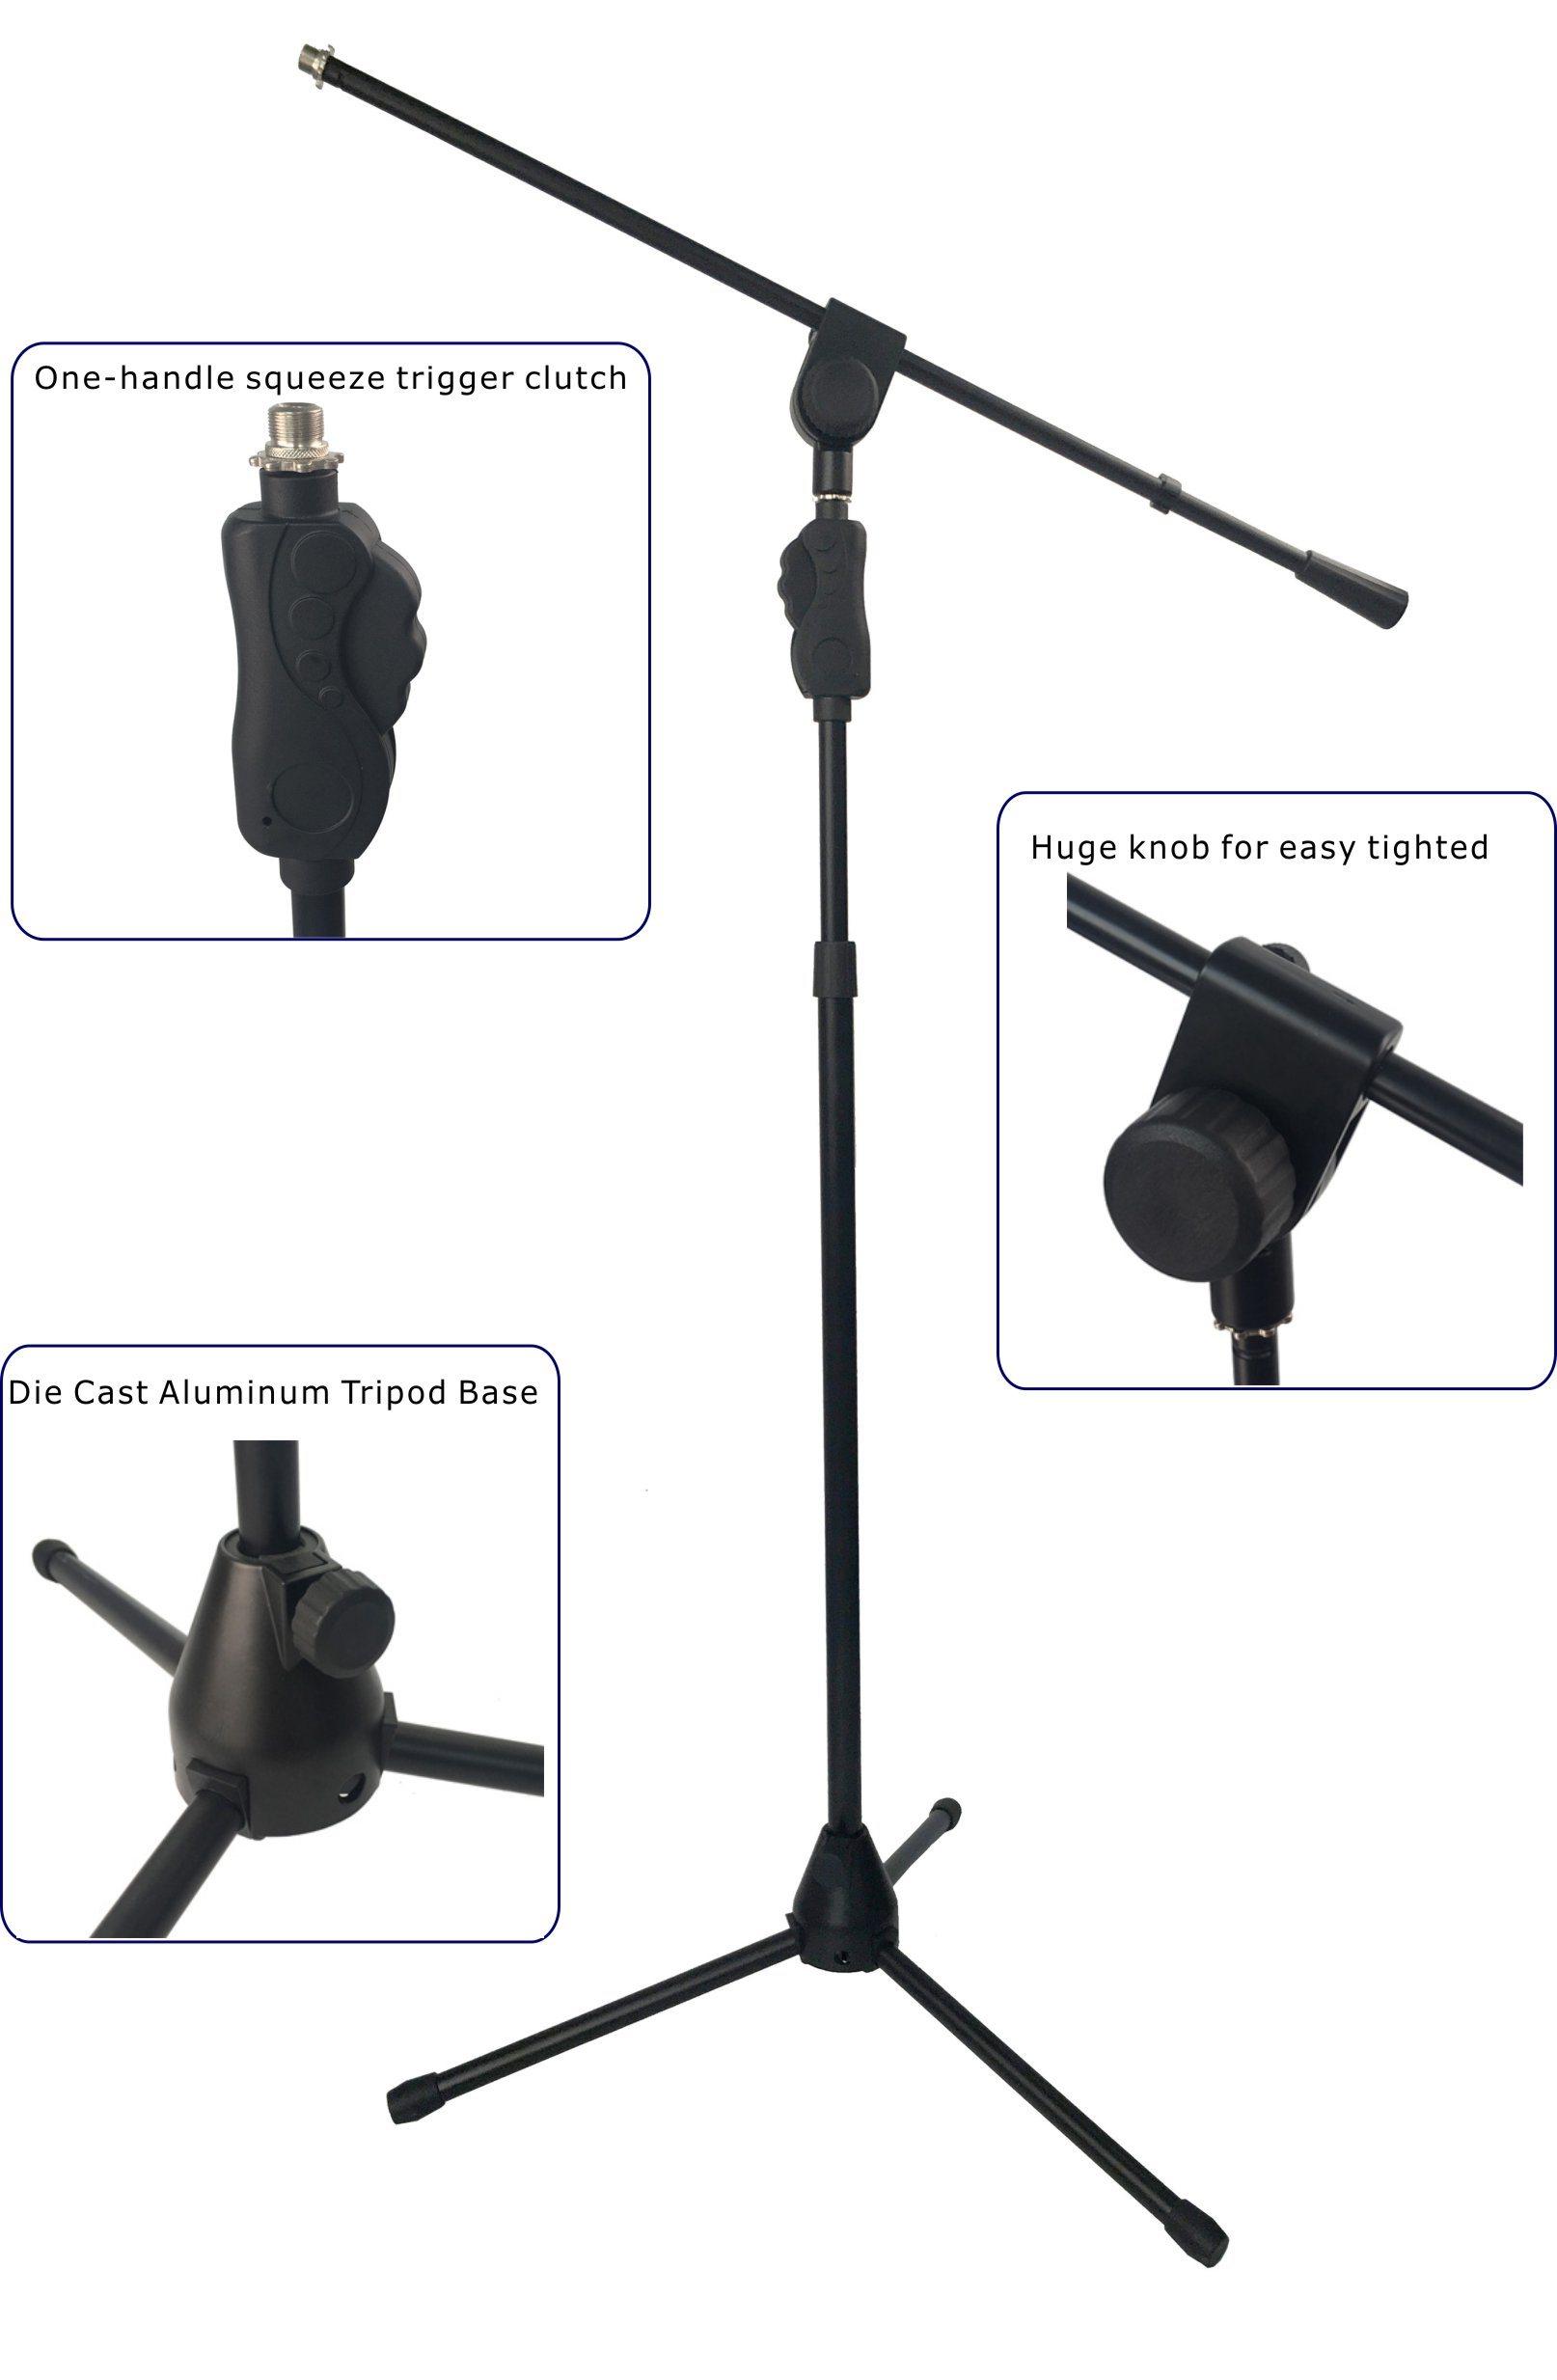 Heavy Duty Die Cast Aluminum Tripod Base Microphone Stand (TMC405)